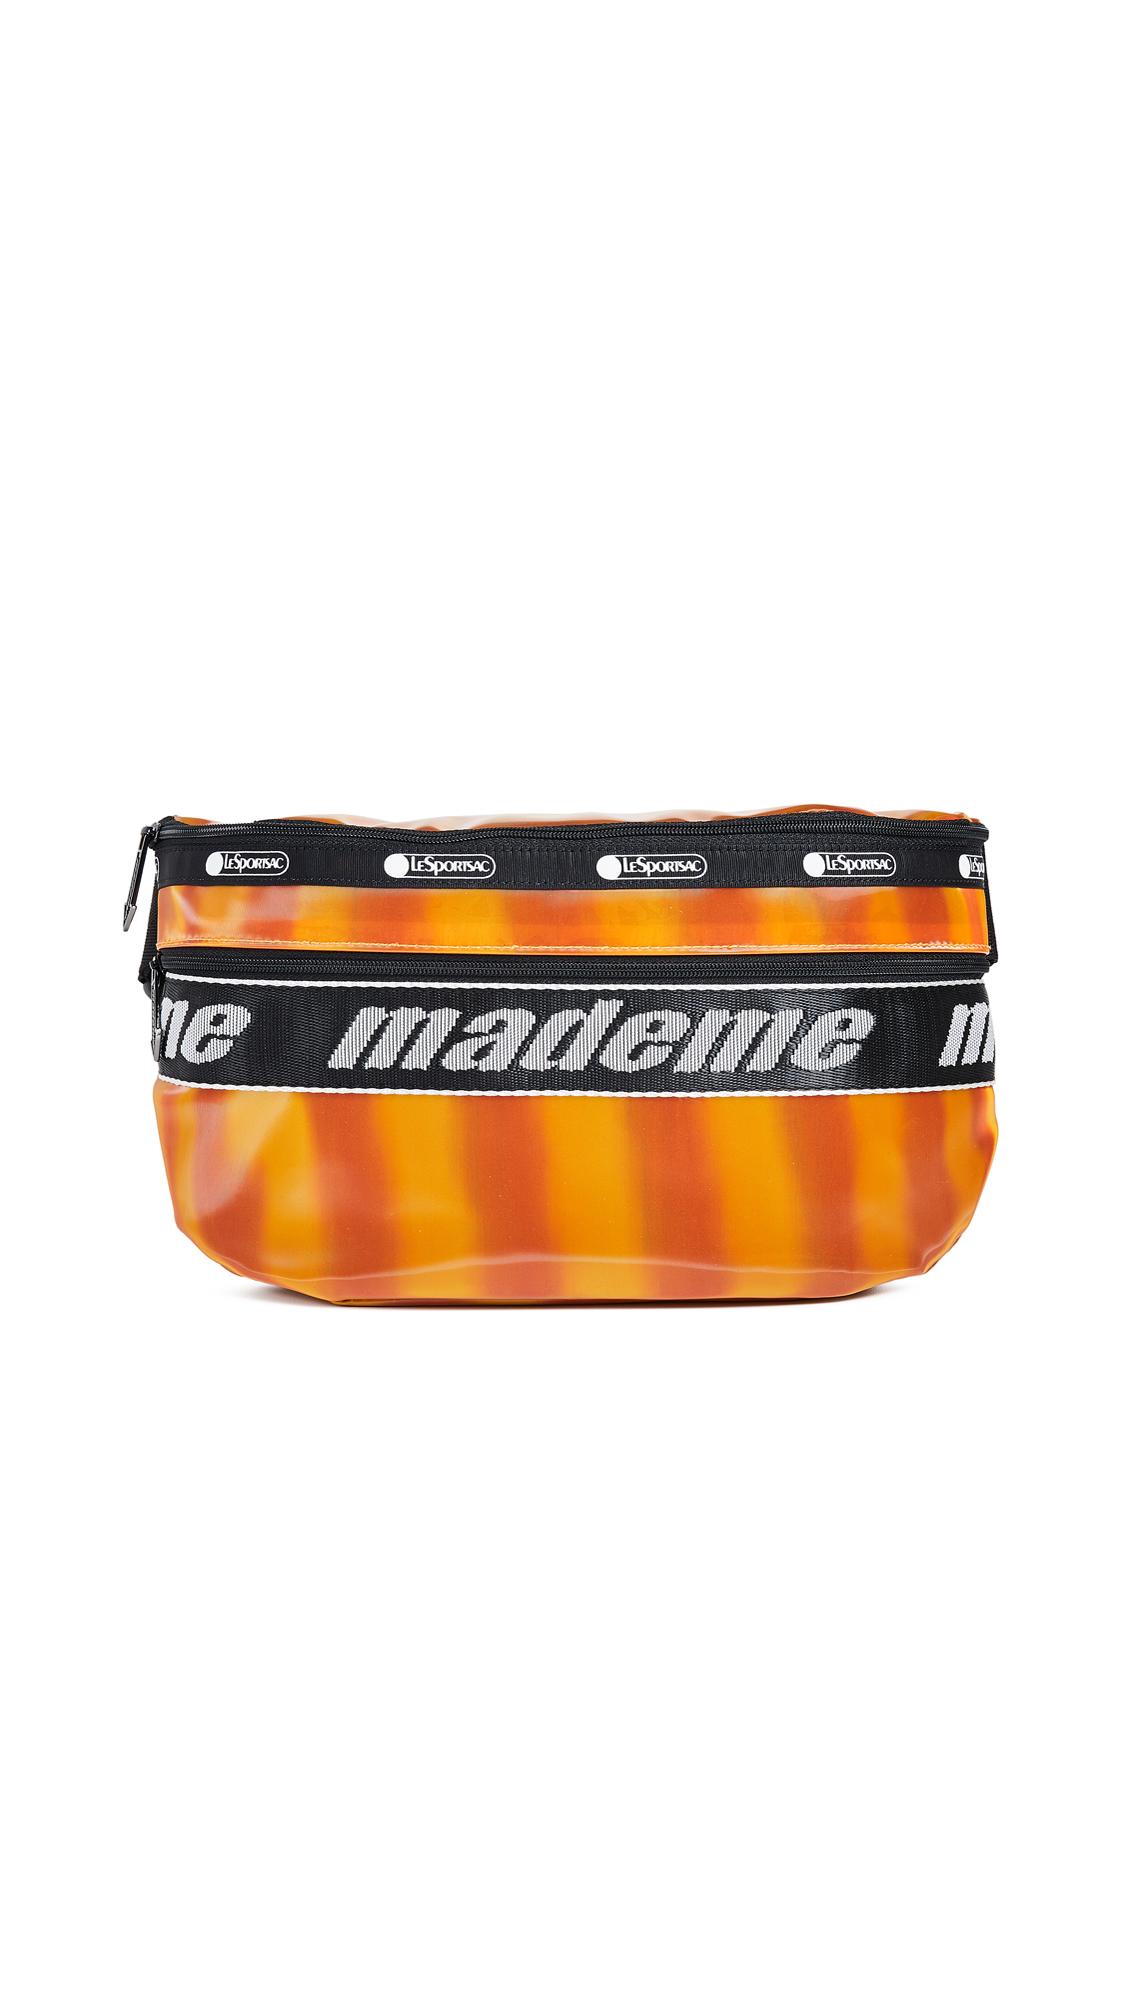 LESPORTSAC X Mademe Belt Bag in Yellow